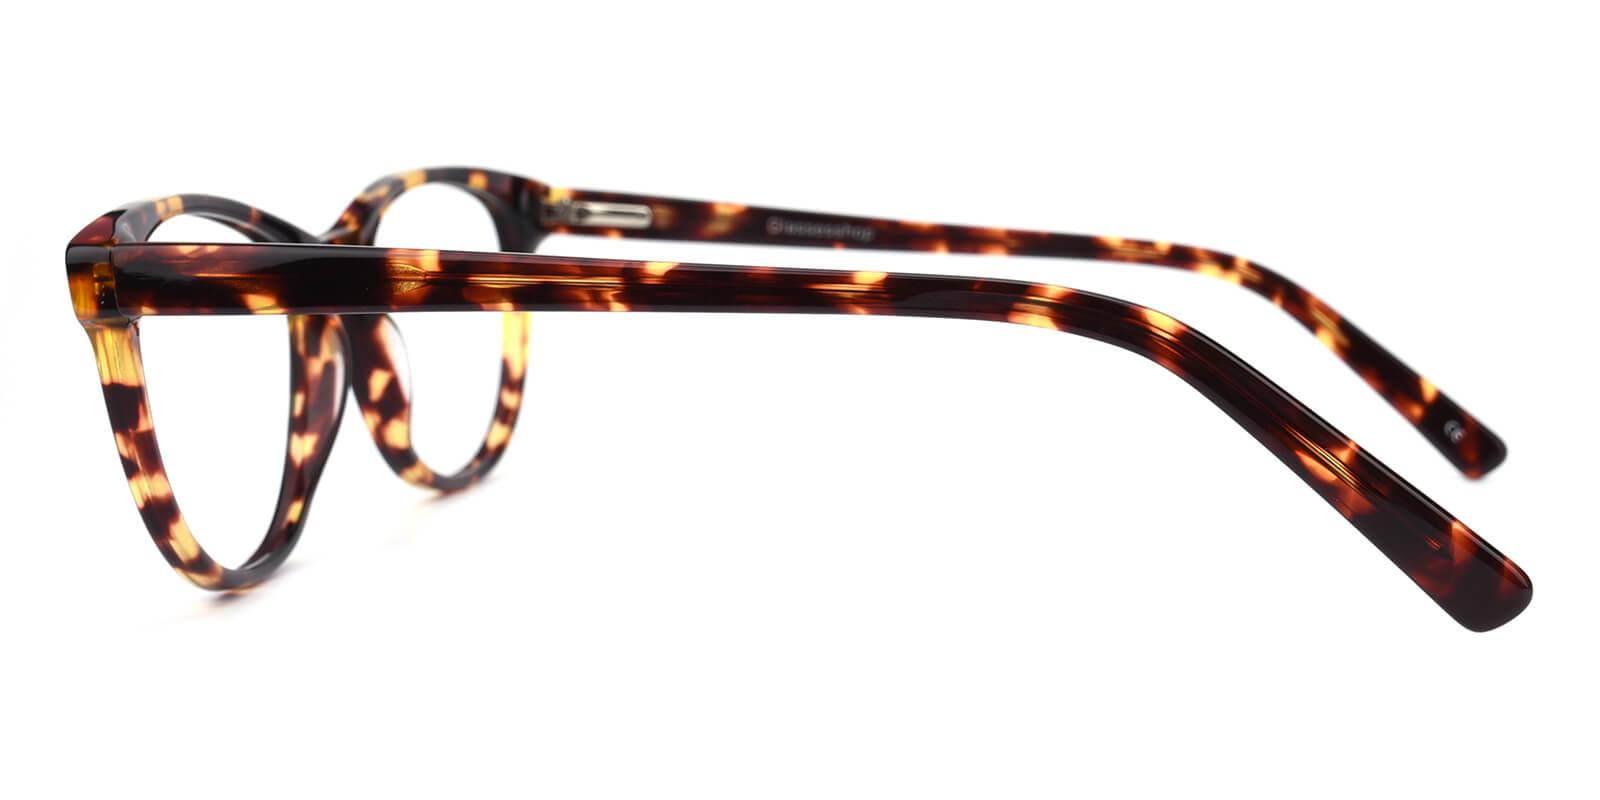 Neptunus-Pattern-Cat-Acetate-Eyeglasses-additional3